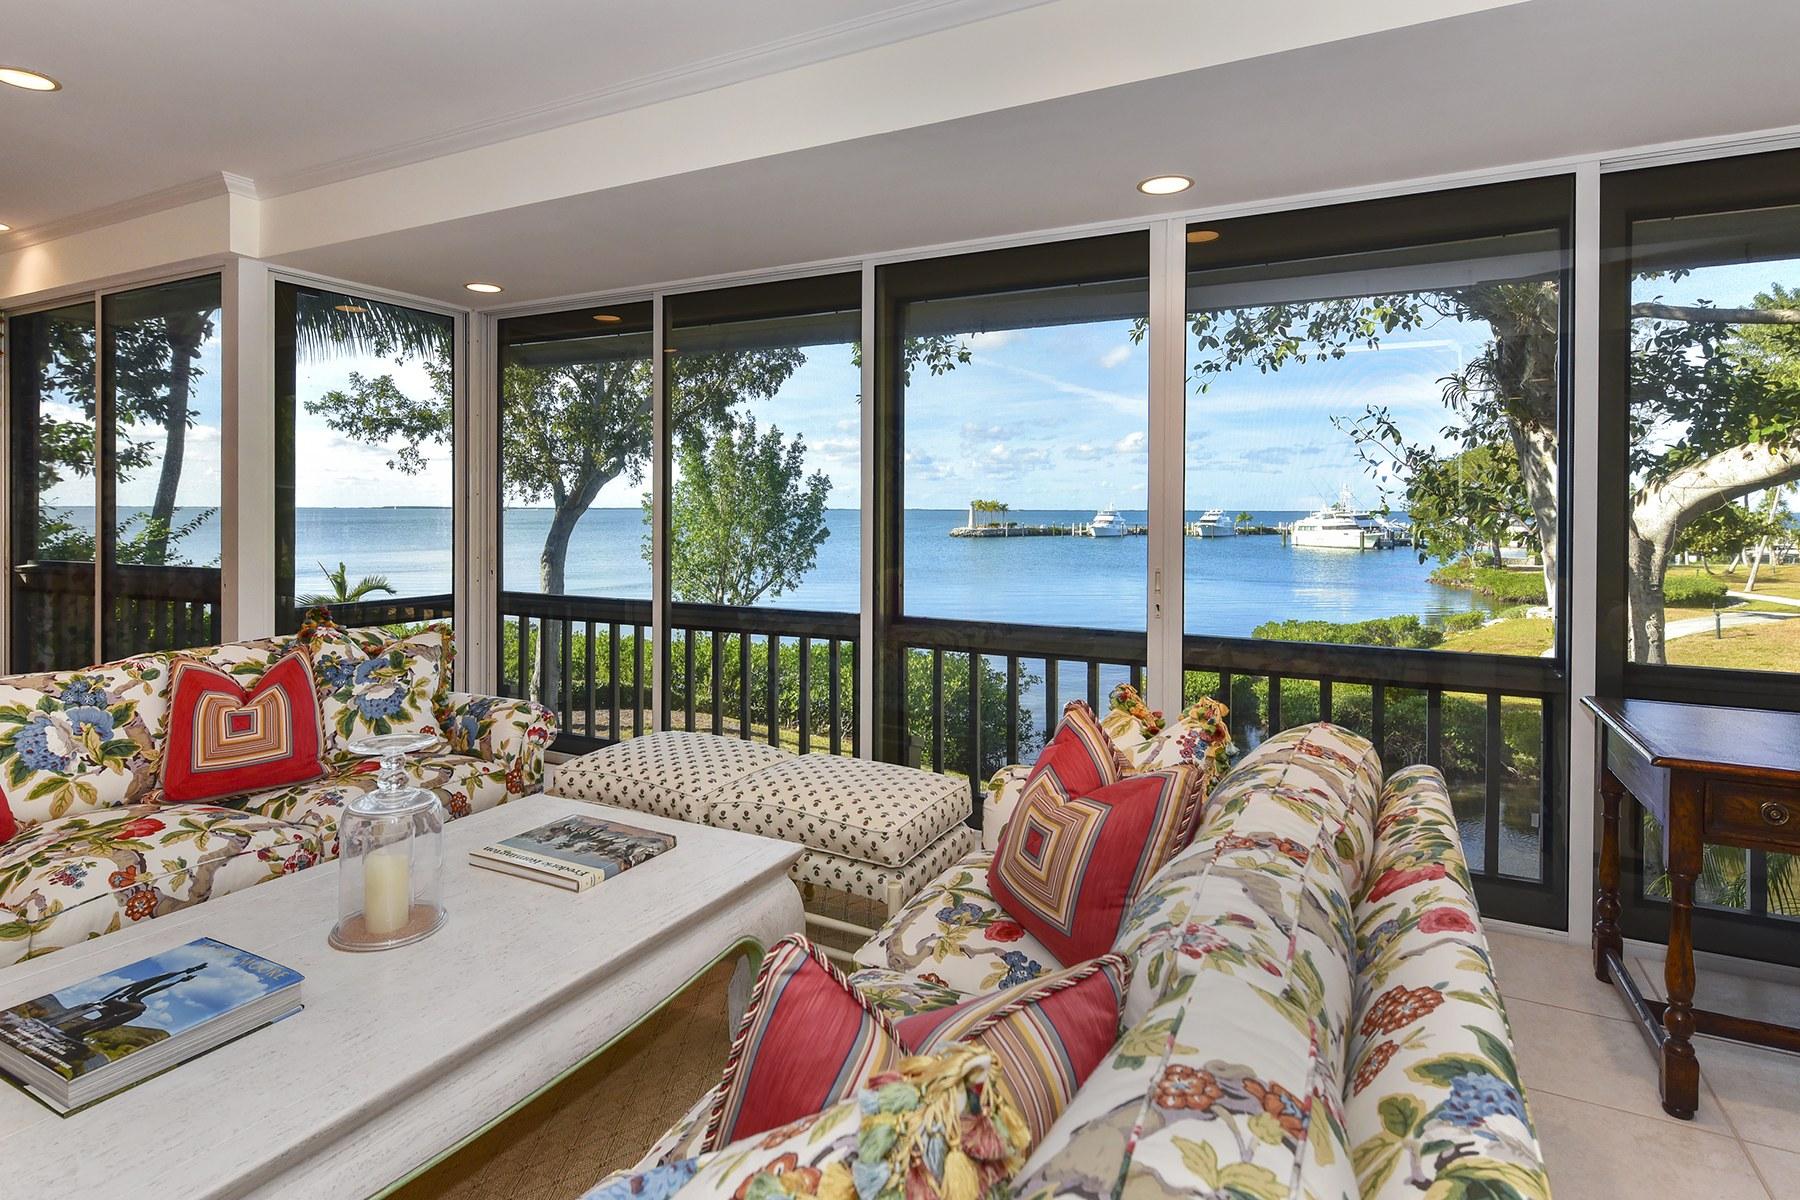 Condominiums for Sale at 29 Island Drive, Key Largo, FL Key Largo, Florida 33037 United States